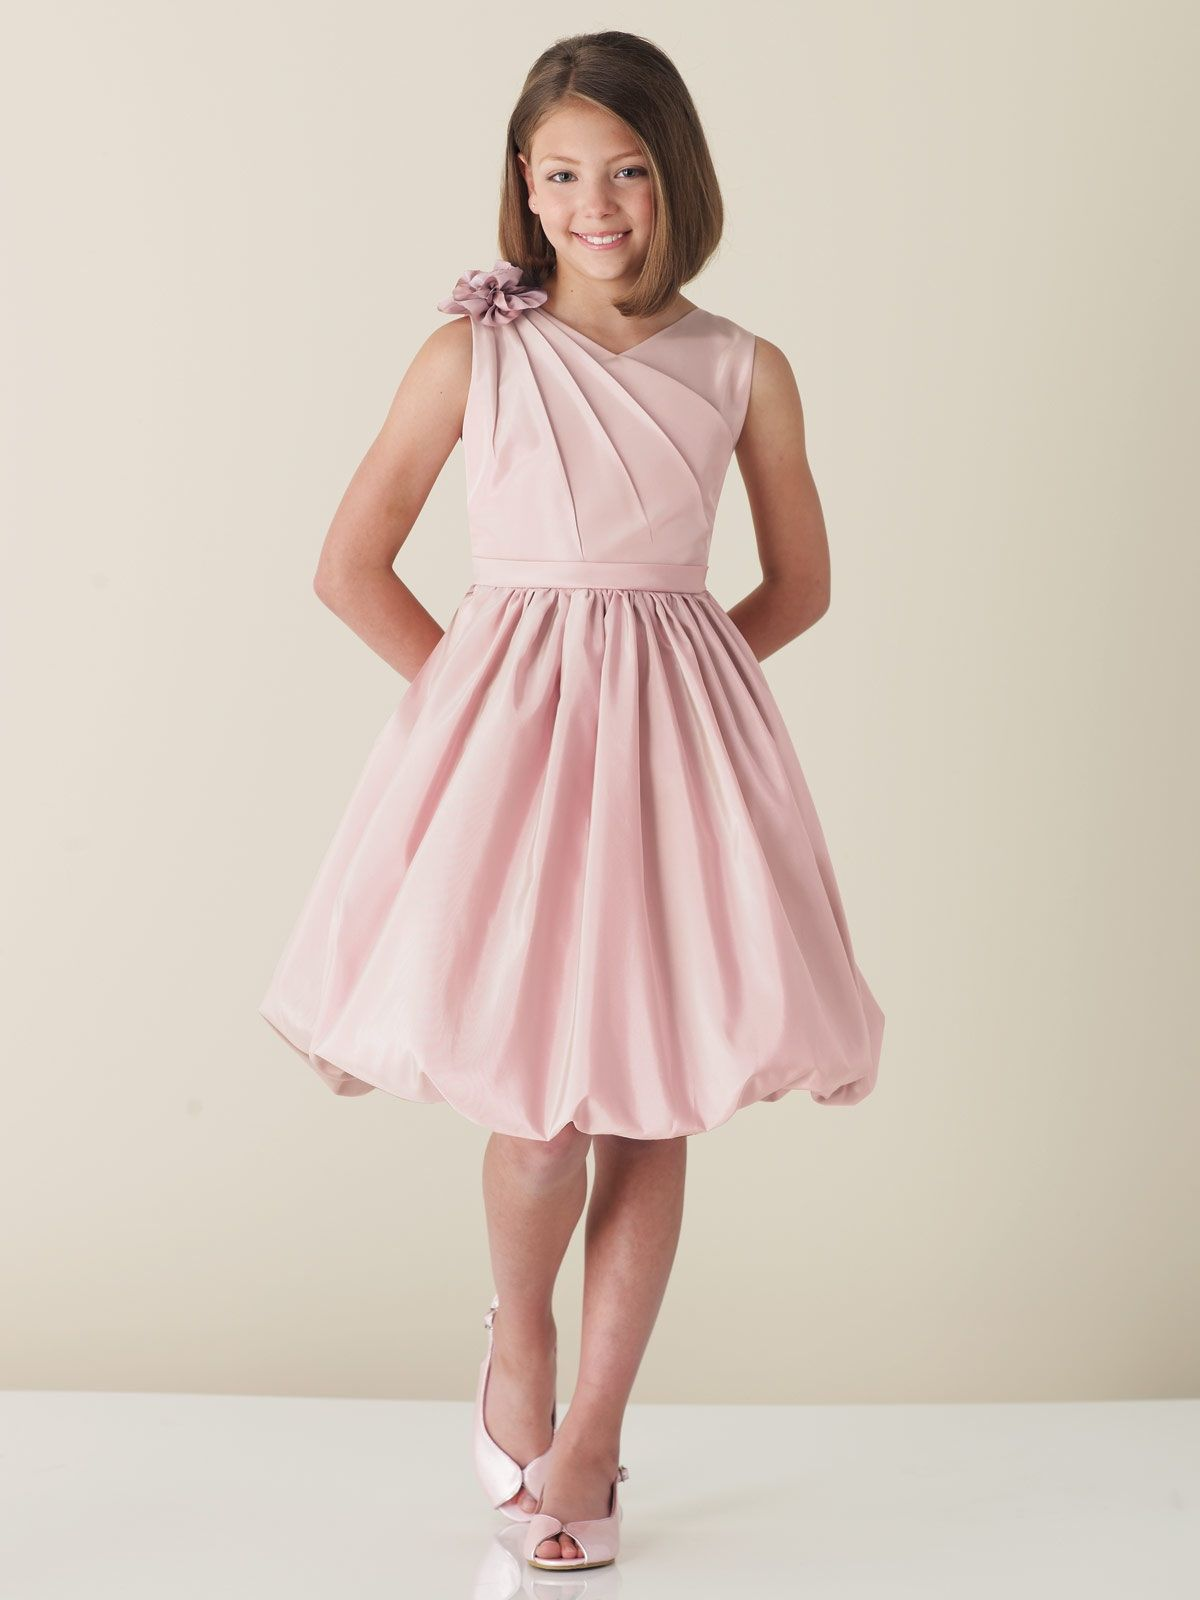 Cute little junior bridesmaid dress!   A girl can dream <3   Pinterest